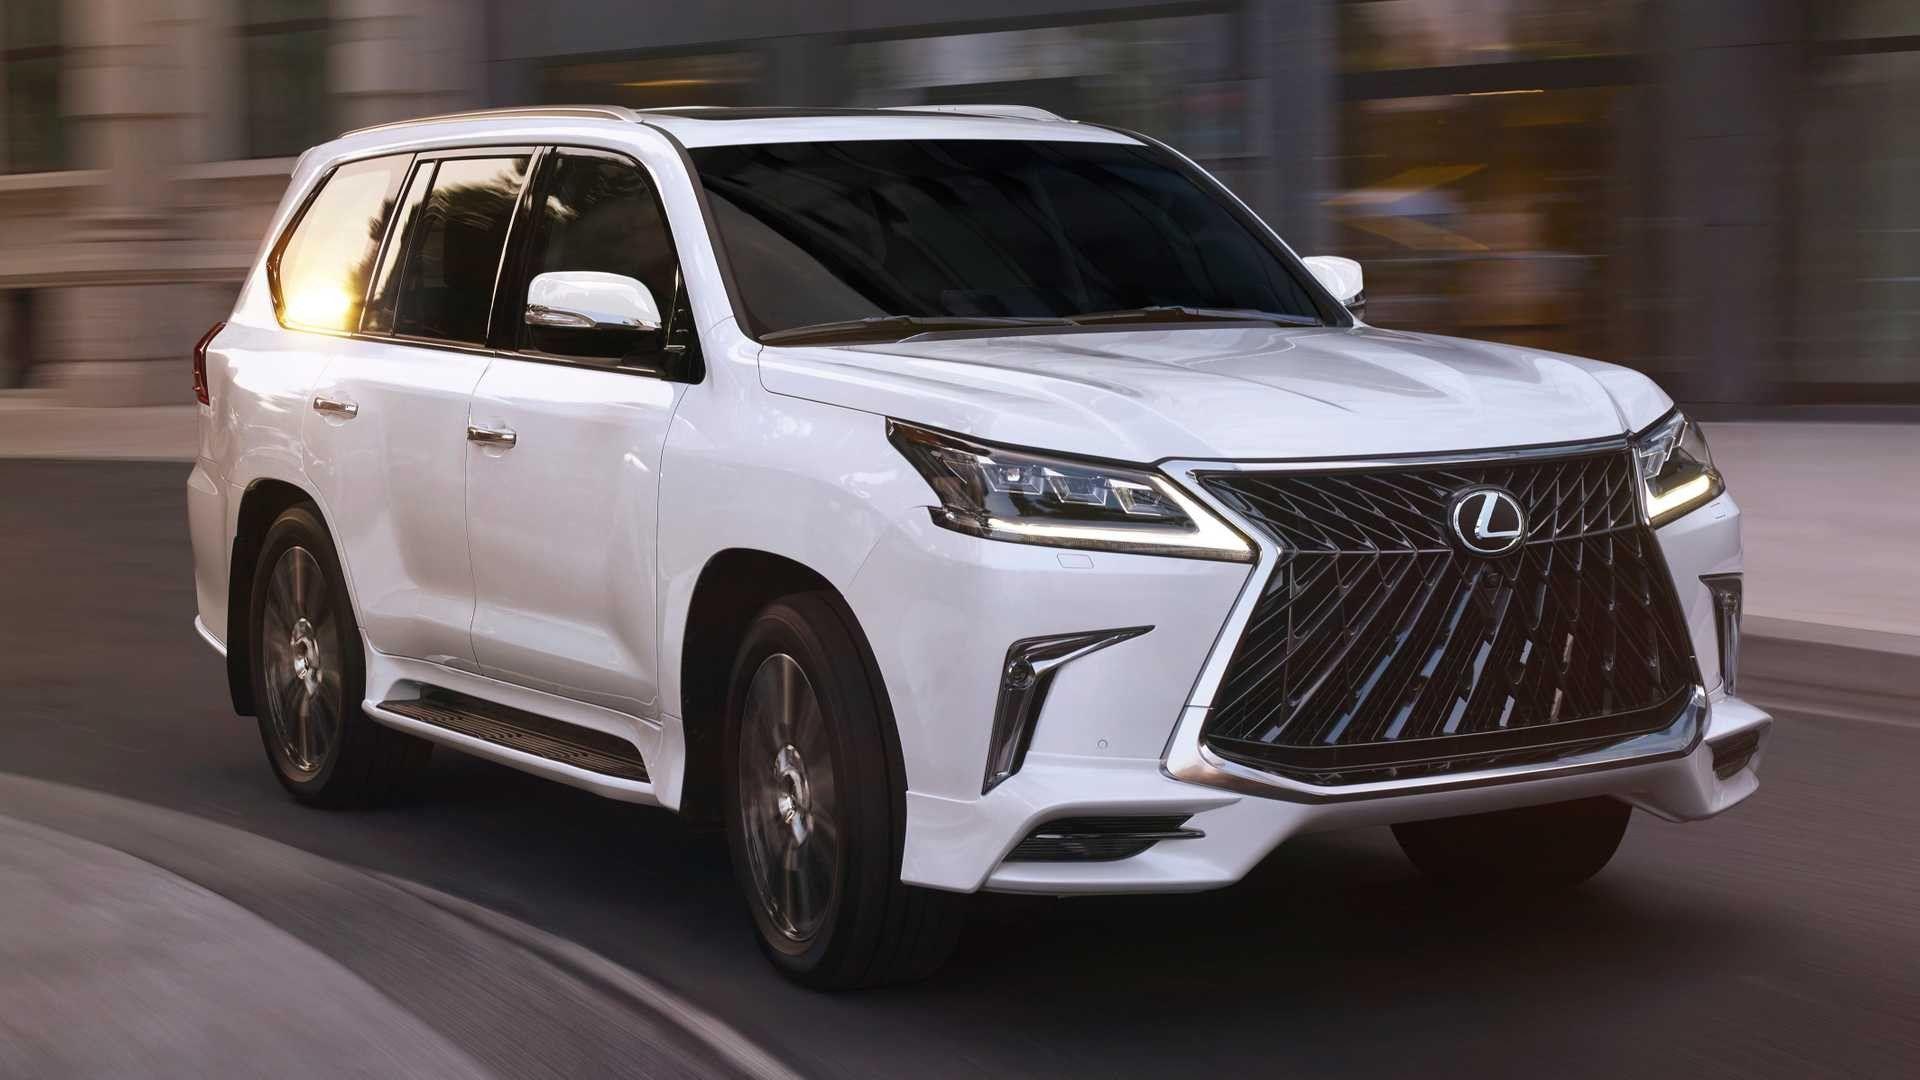 Lexus Suv Models 2020 Review And Specs In 2020 Lexus Suv Lexus Lx570 Lexus